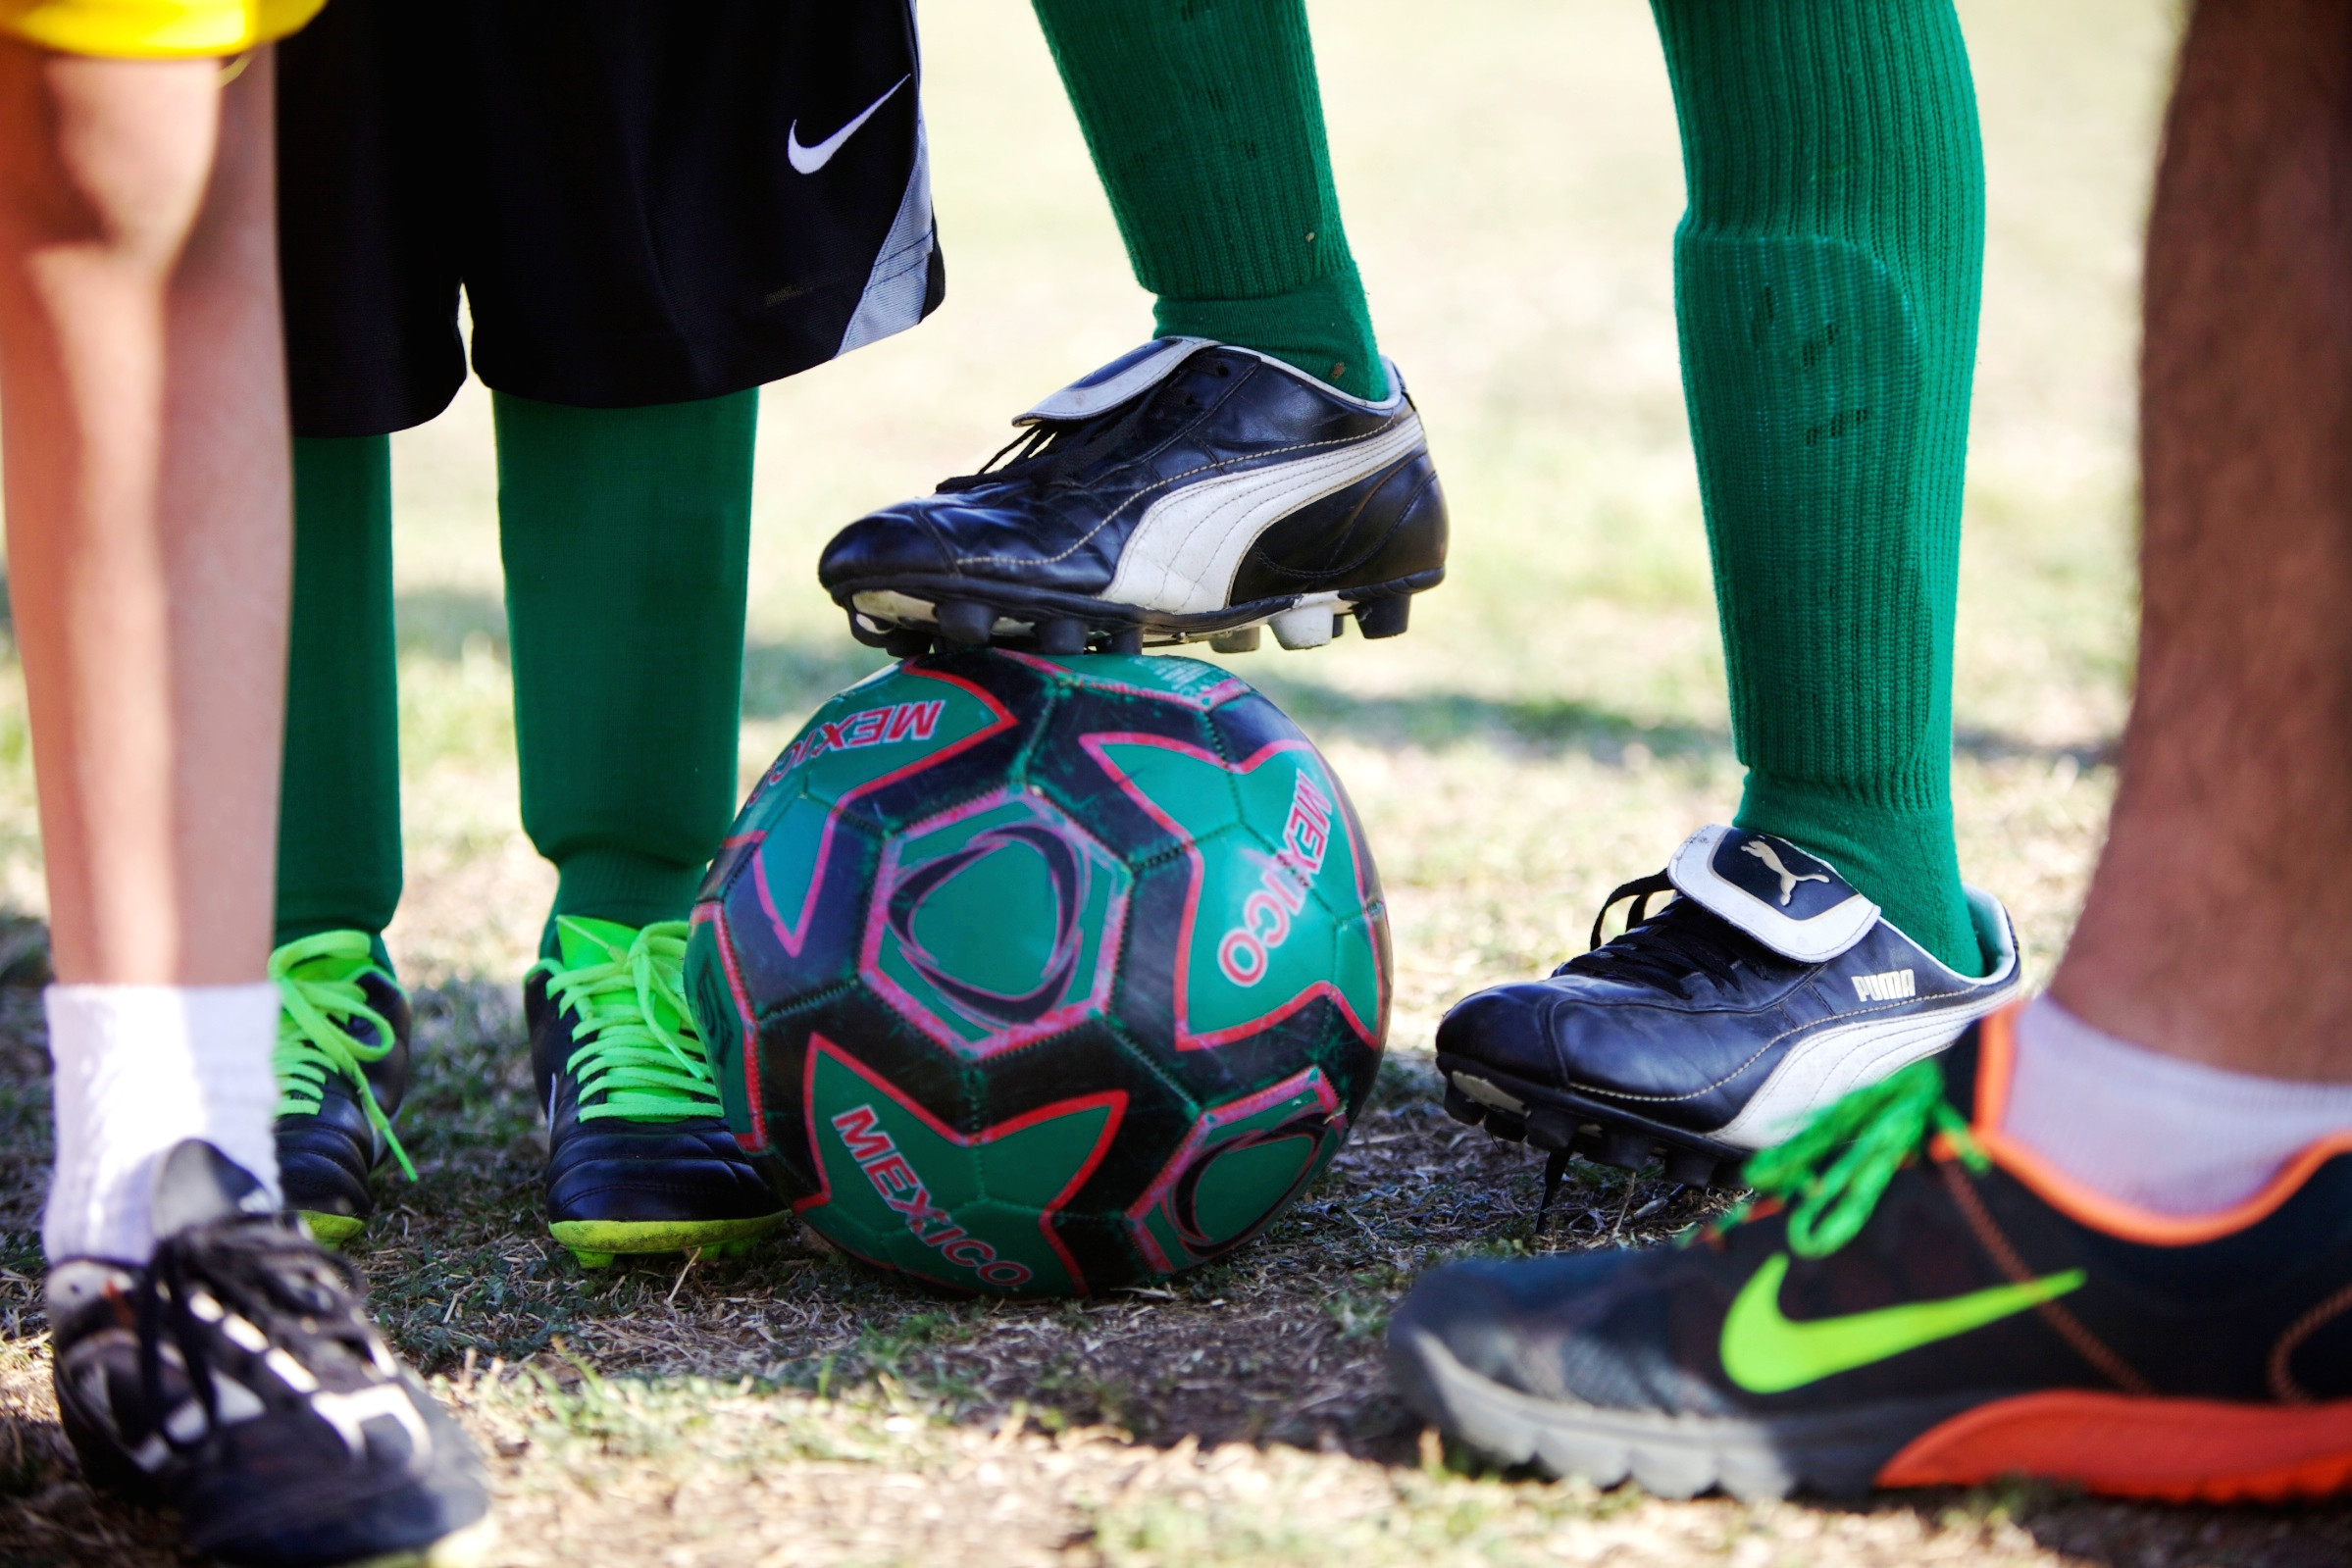 join tfa teach for america foot on soccer ball